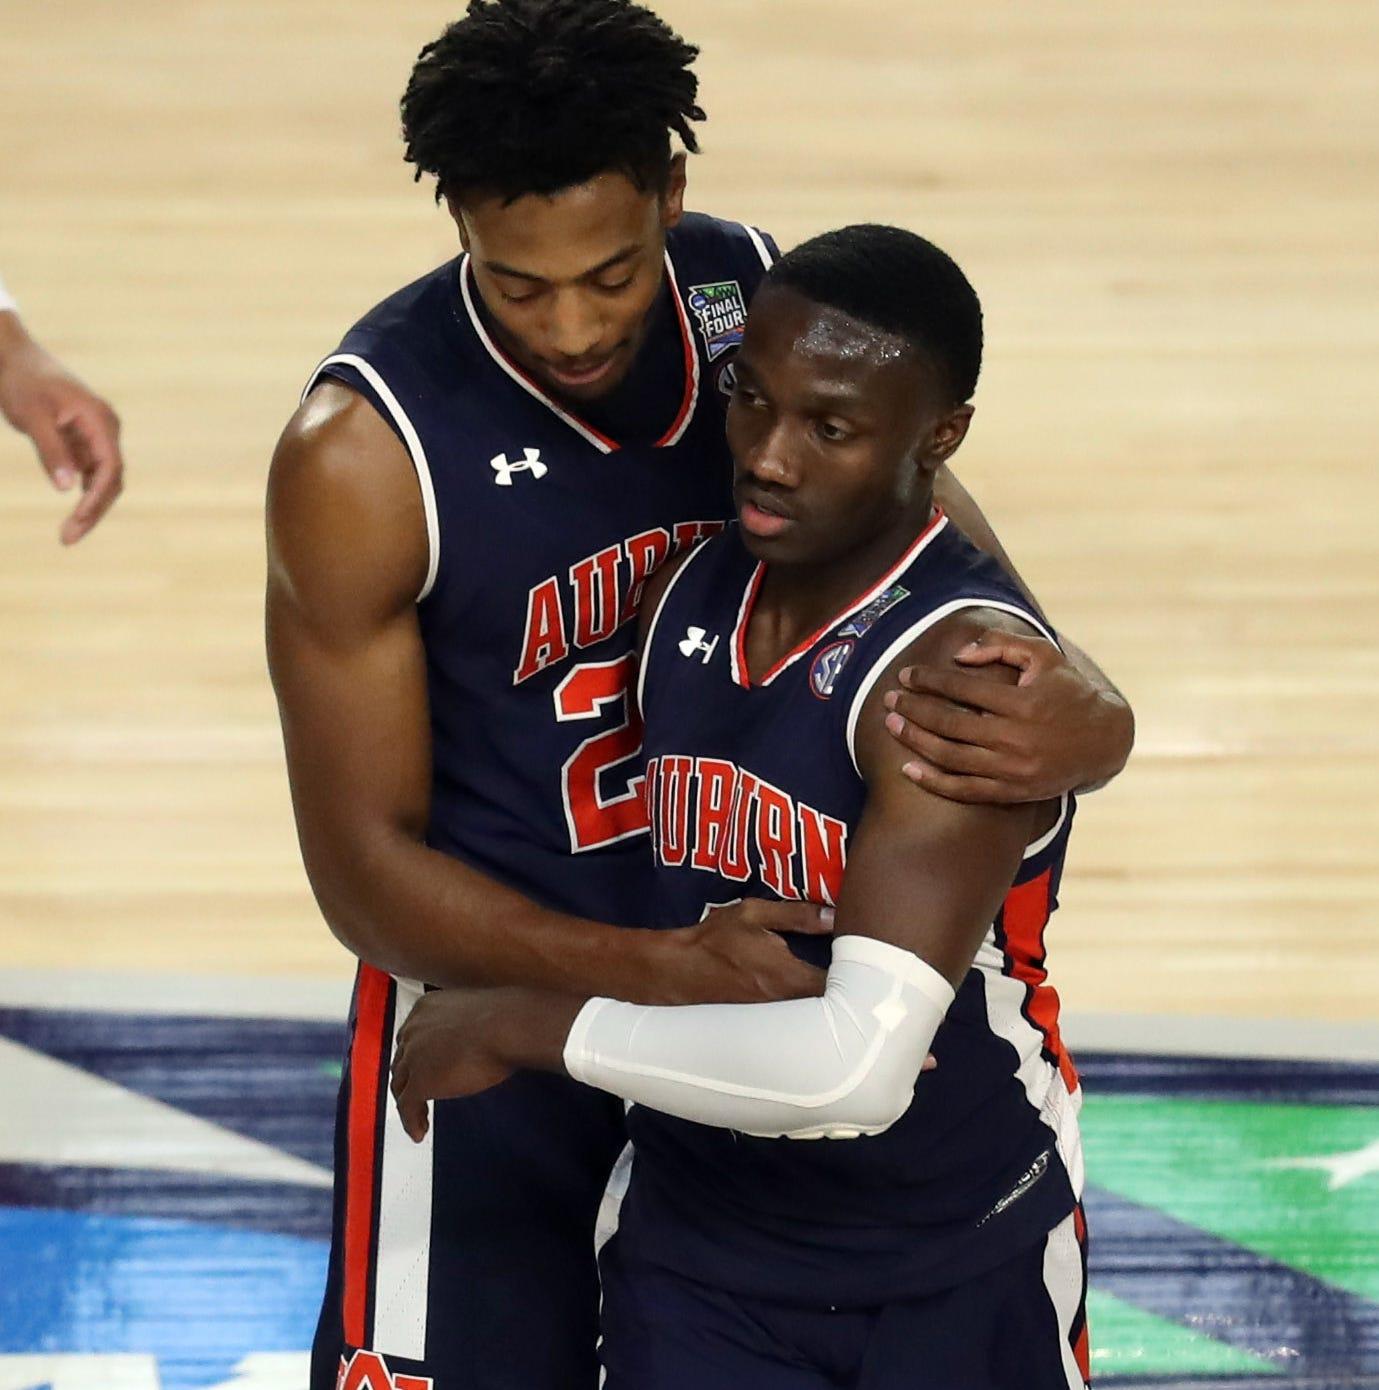 Auburn basketball: Fans sad but supportive of Jared Harper entering 2019 NBA Draft